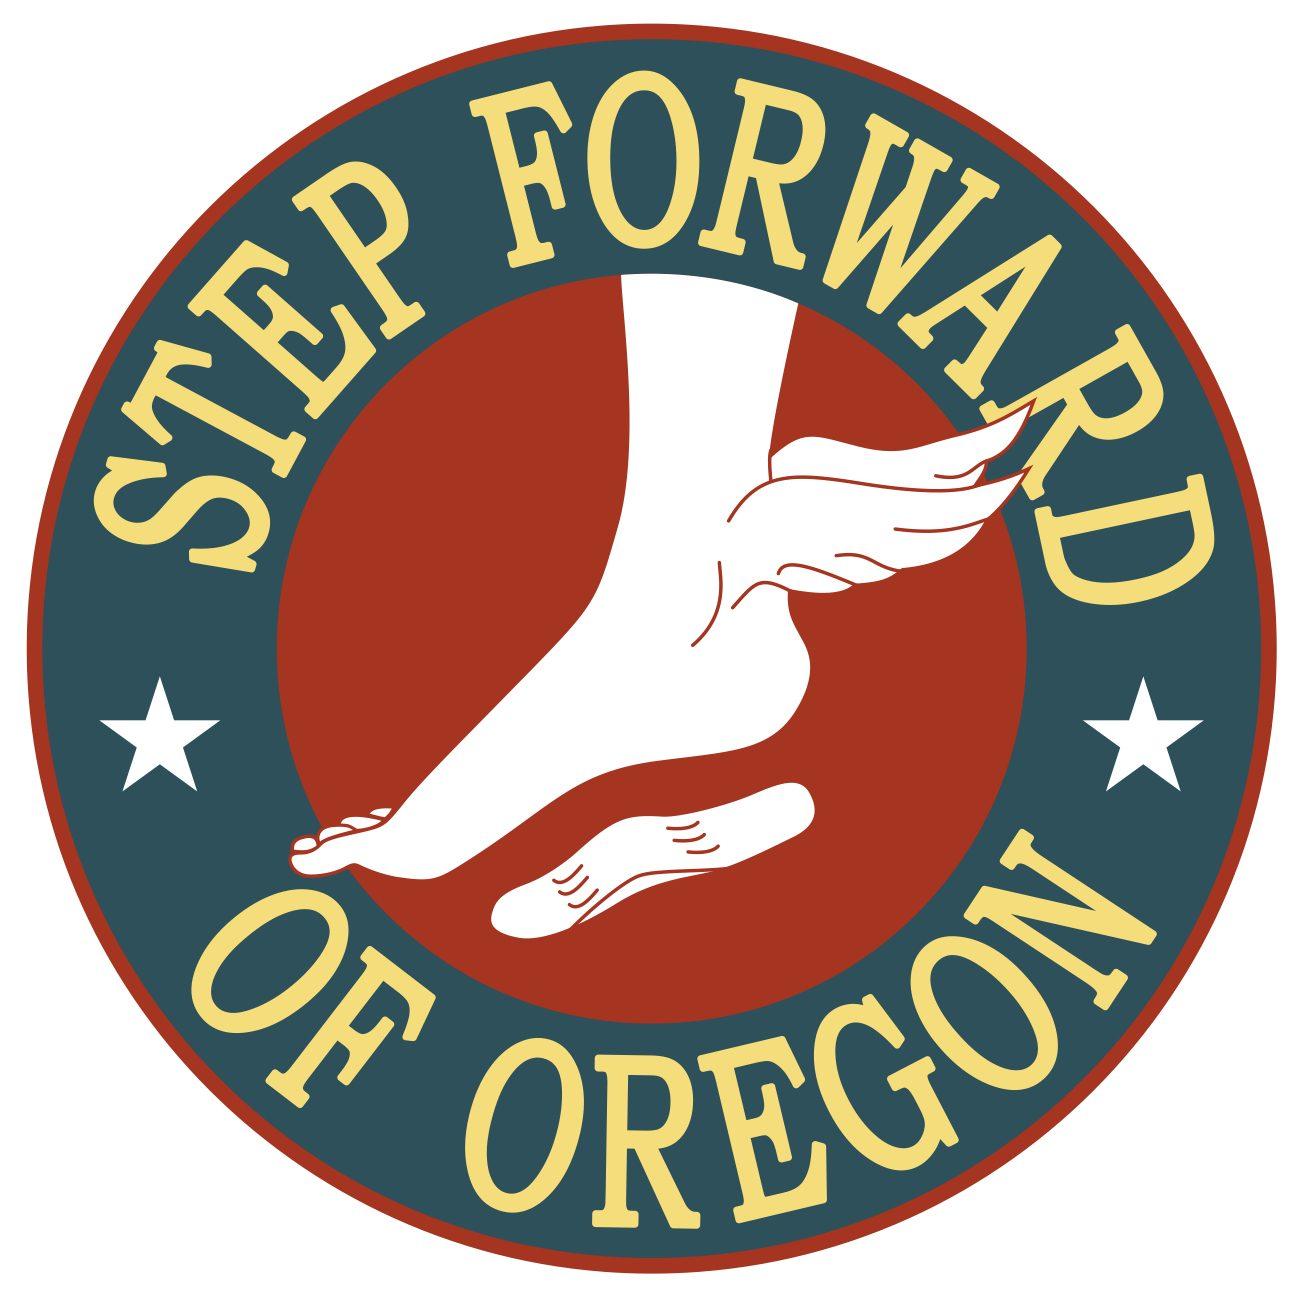 Step Forward of Oregon:  Orthotics, Reiki, Reflexology